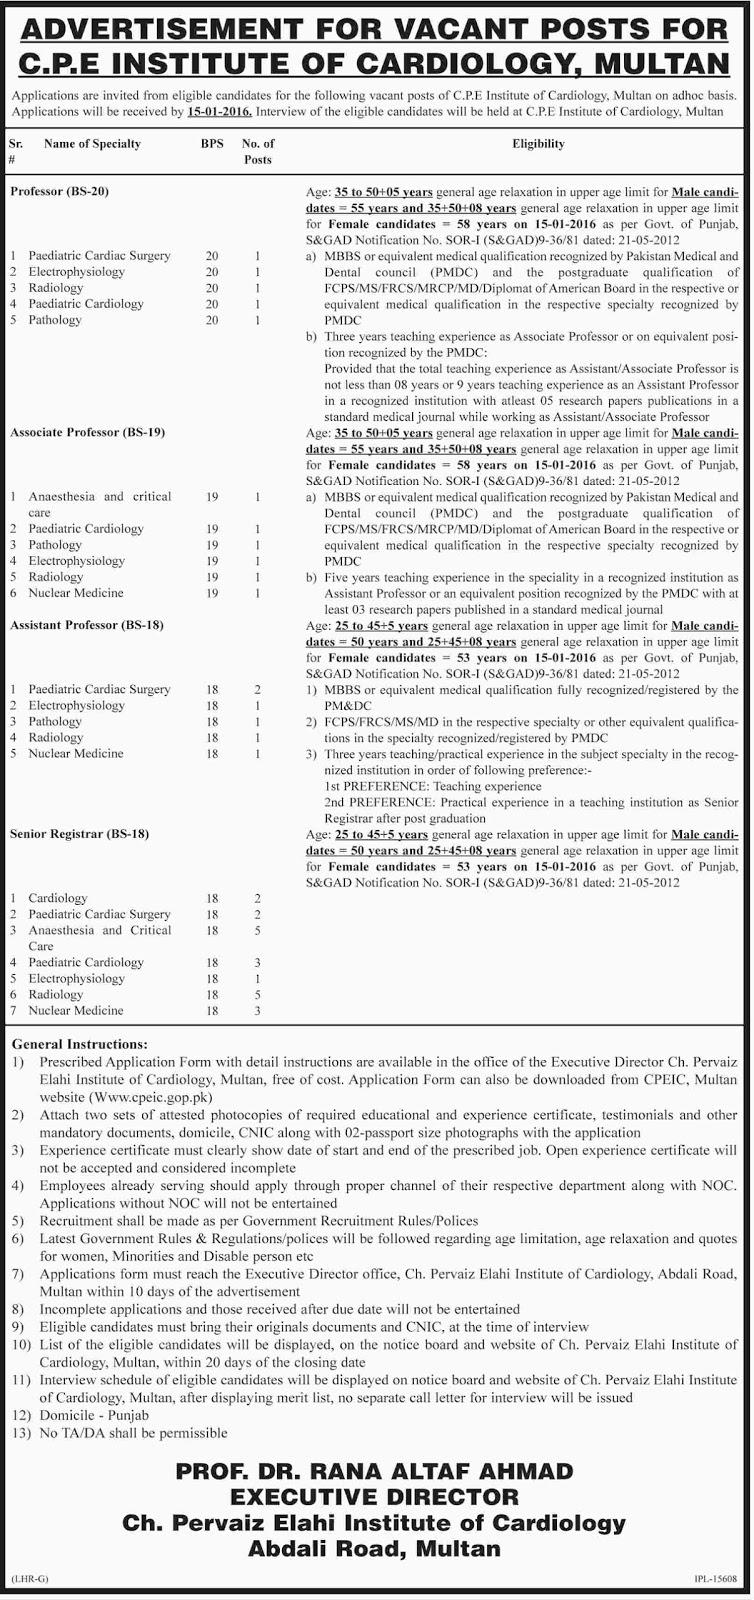 Doctors Jobs in C.P.E Institute of Cardiology Multan